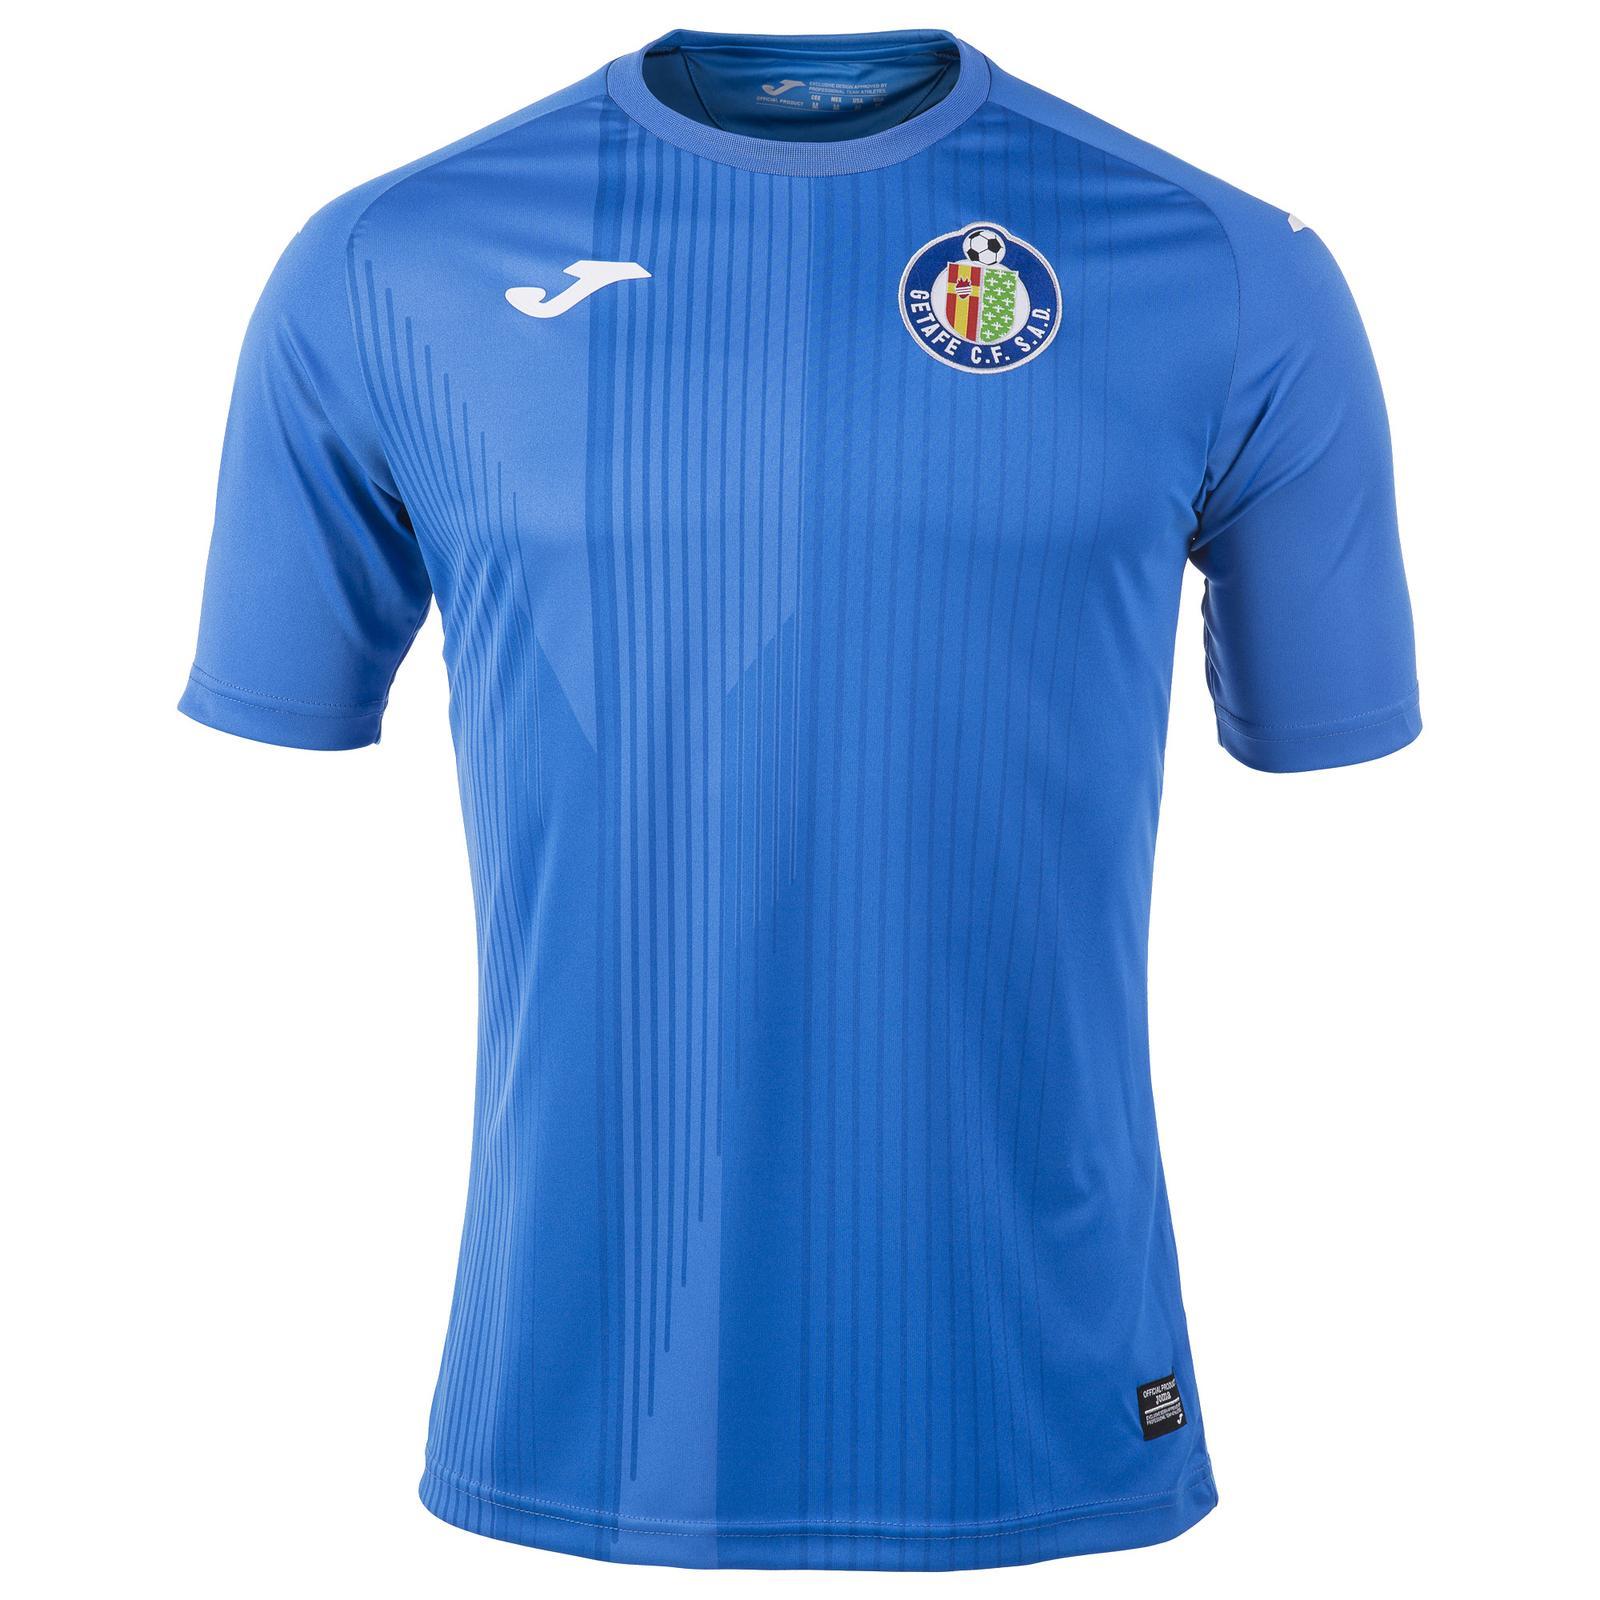 La Liga: Getafe 17-18 La Liga Kits Released